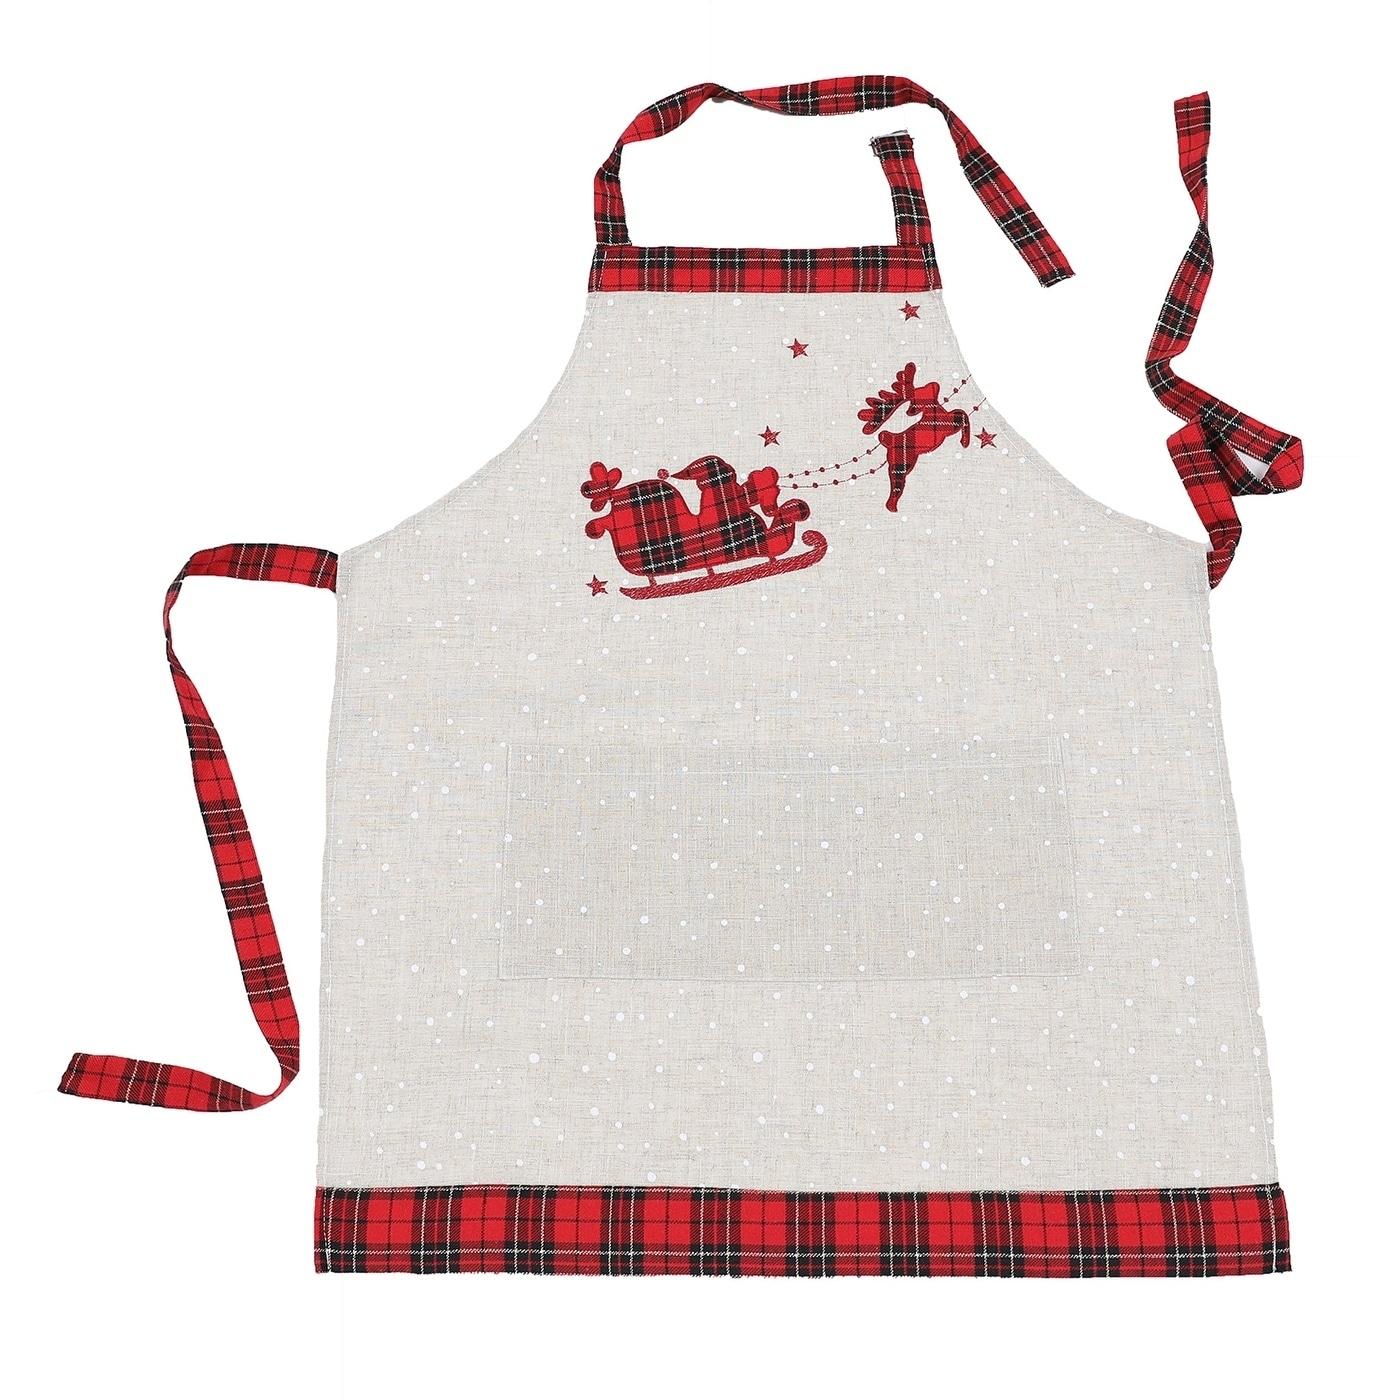 Christmas Apron Santa Reindeer Snowman Adults Apron Chef Cooking Home Gift